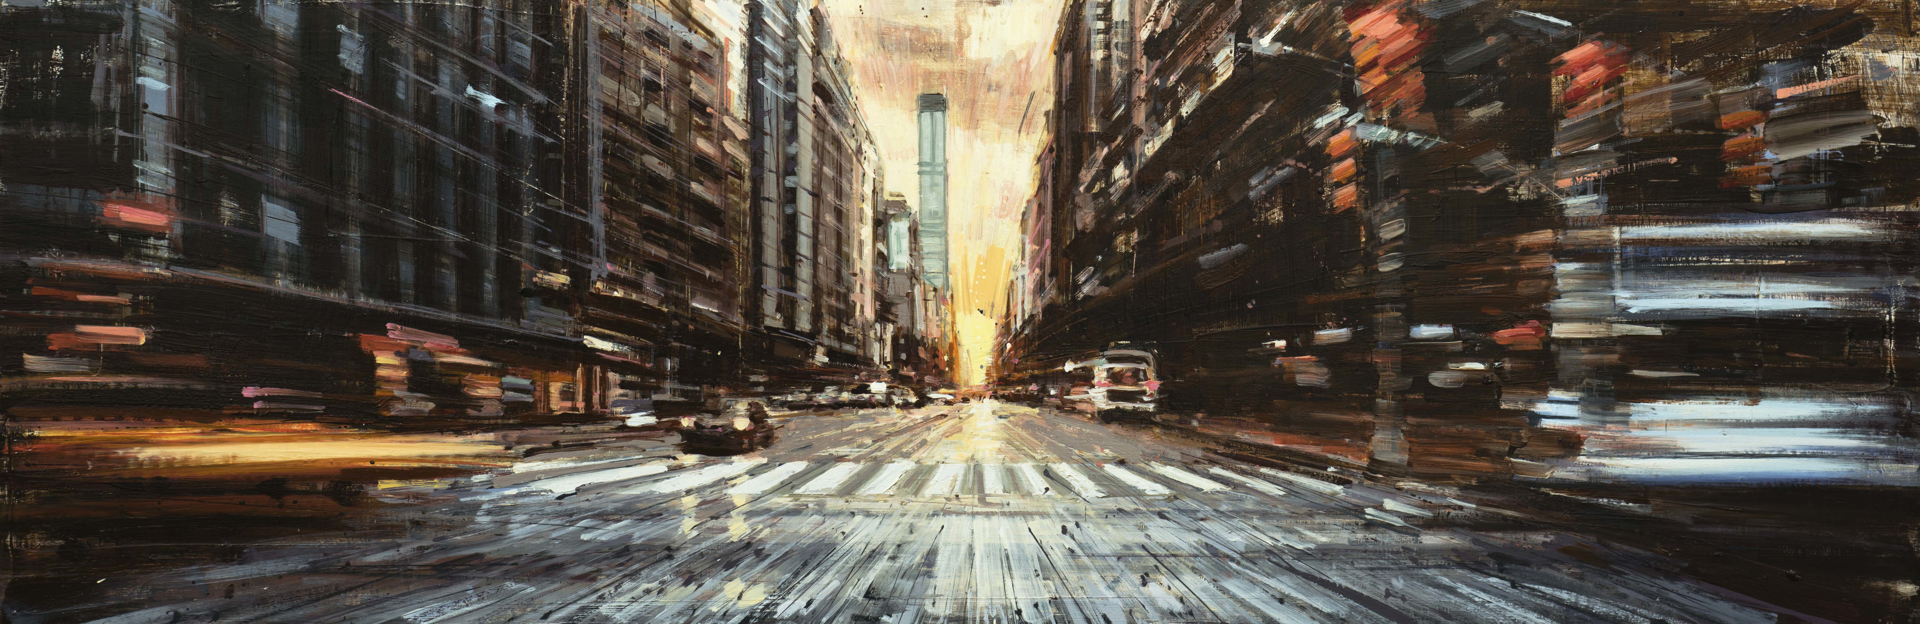 Manhattanhenge by Valerio D'Ospina